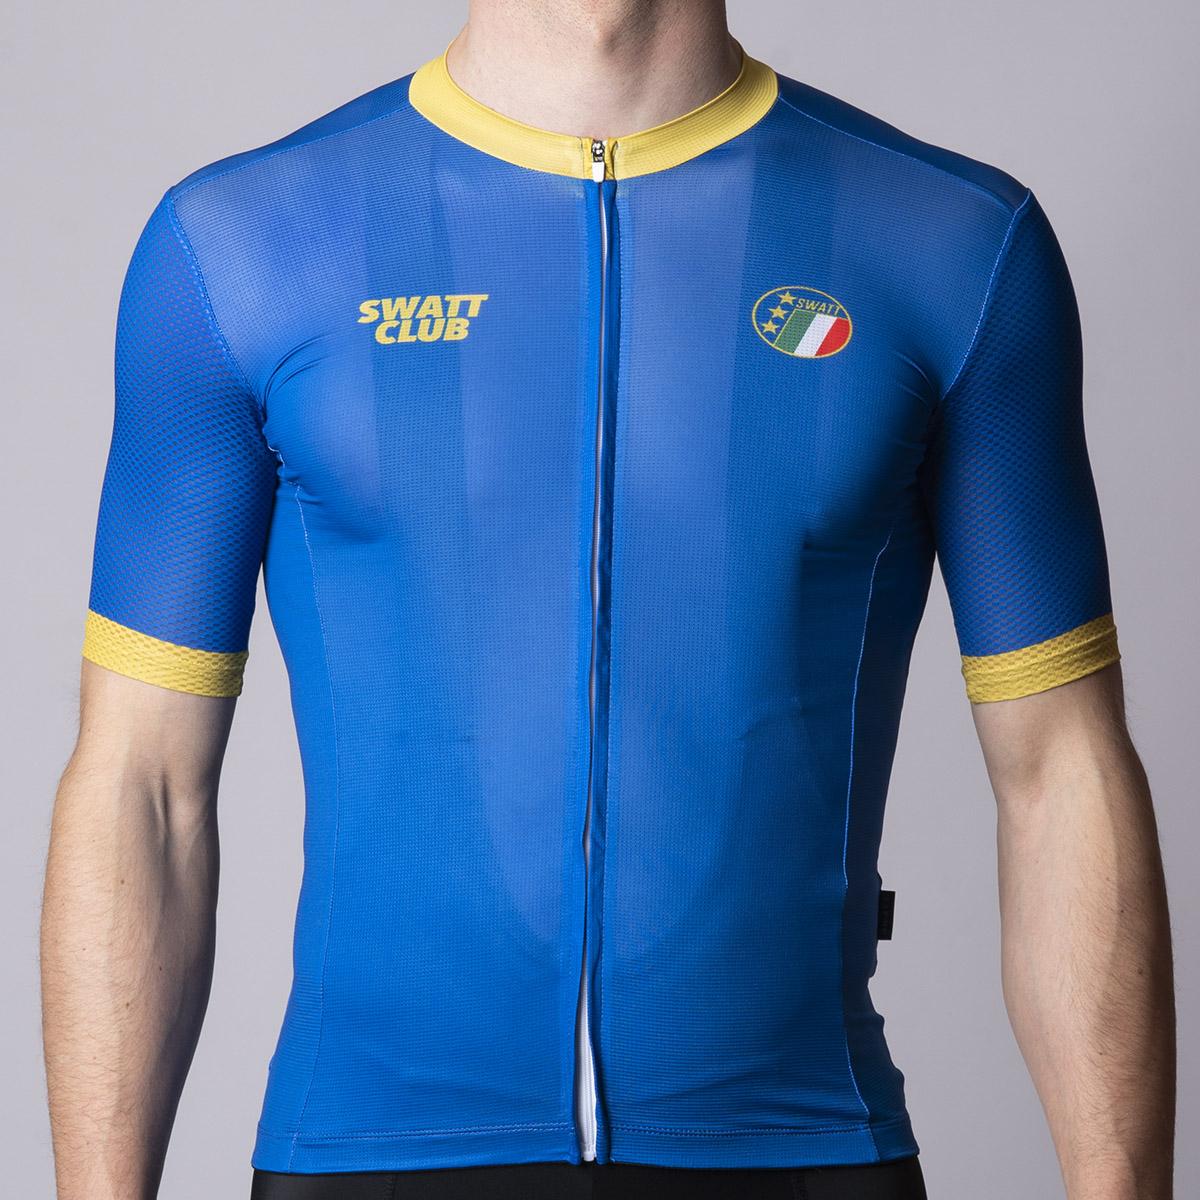 Italia swatt club cycling kit